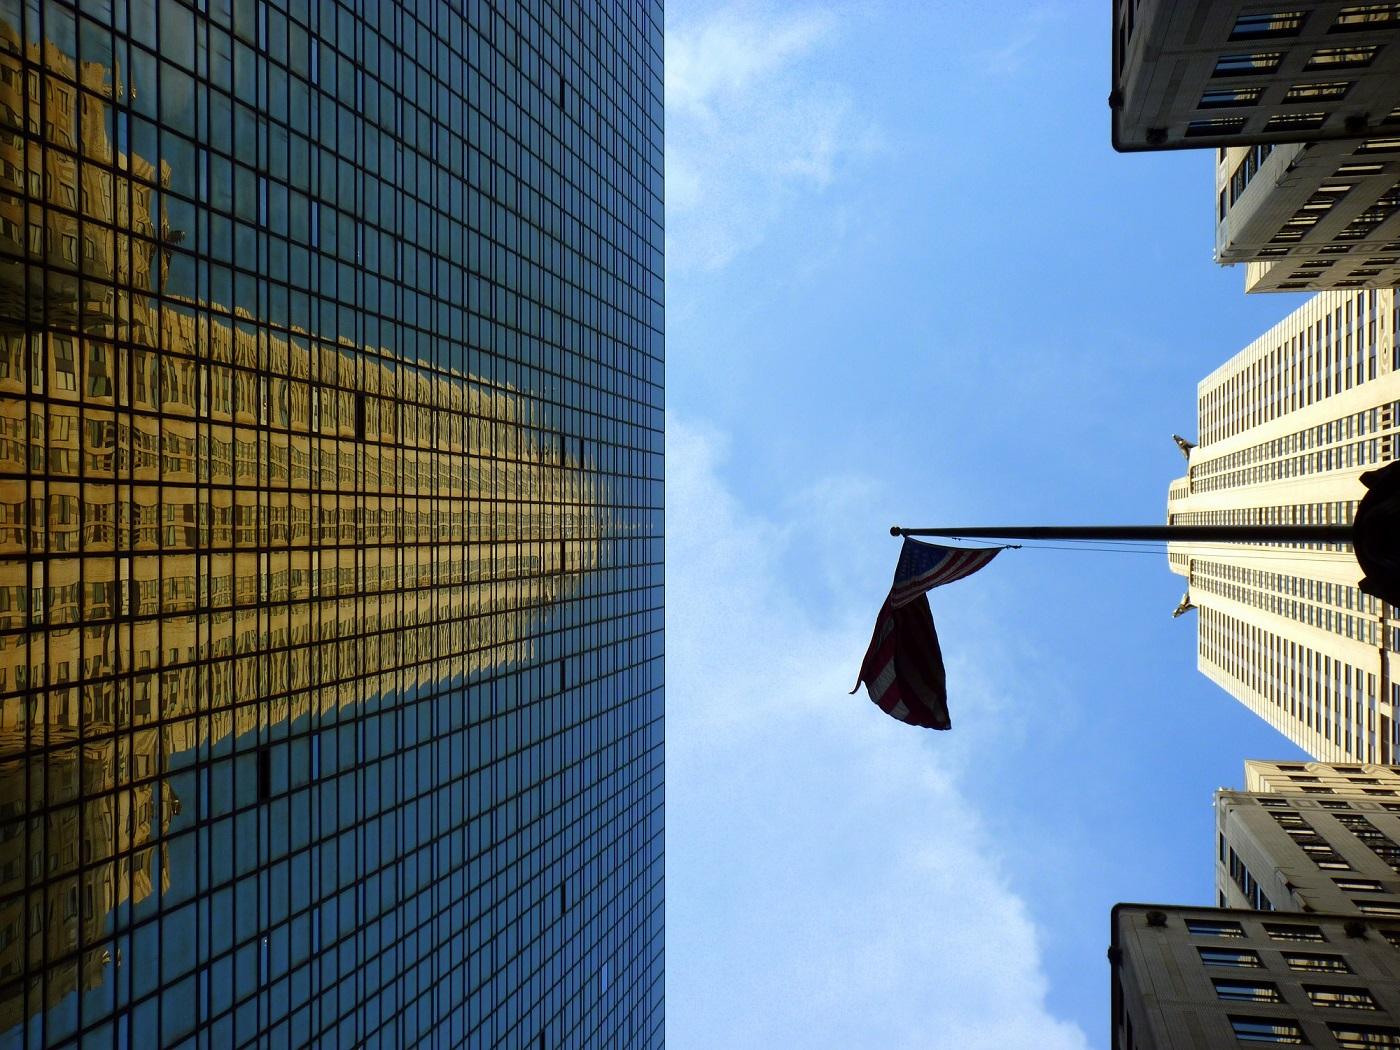 Rockefeller Gebäude USA Bild